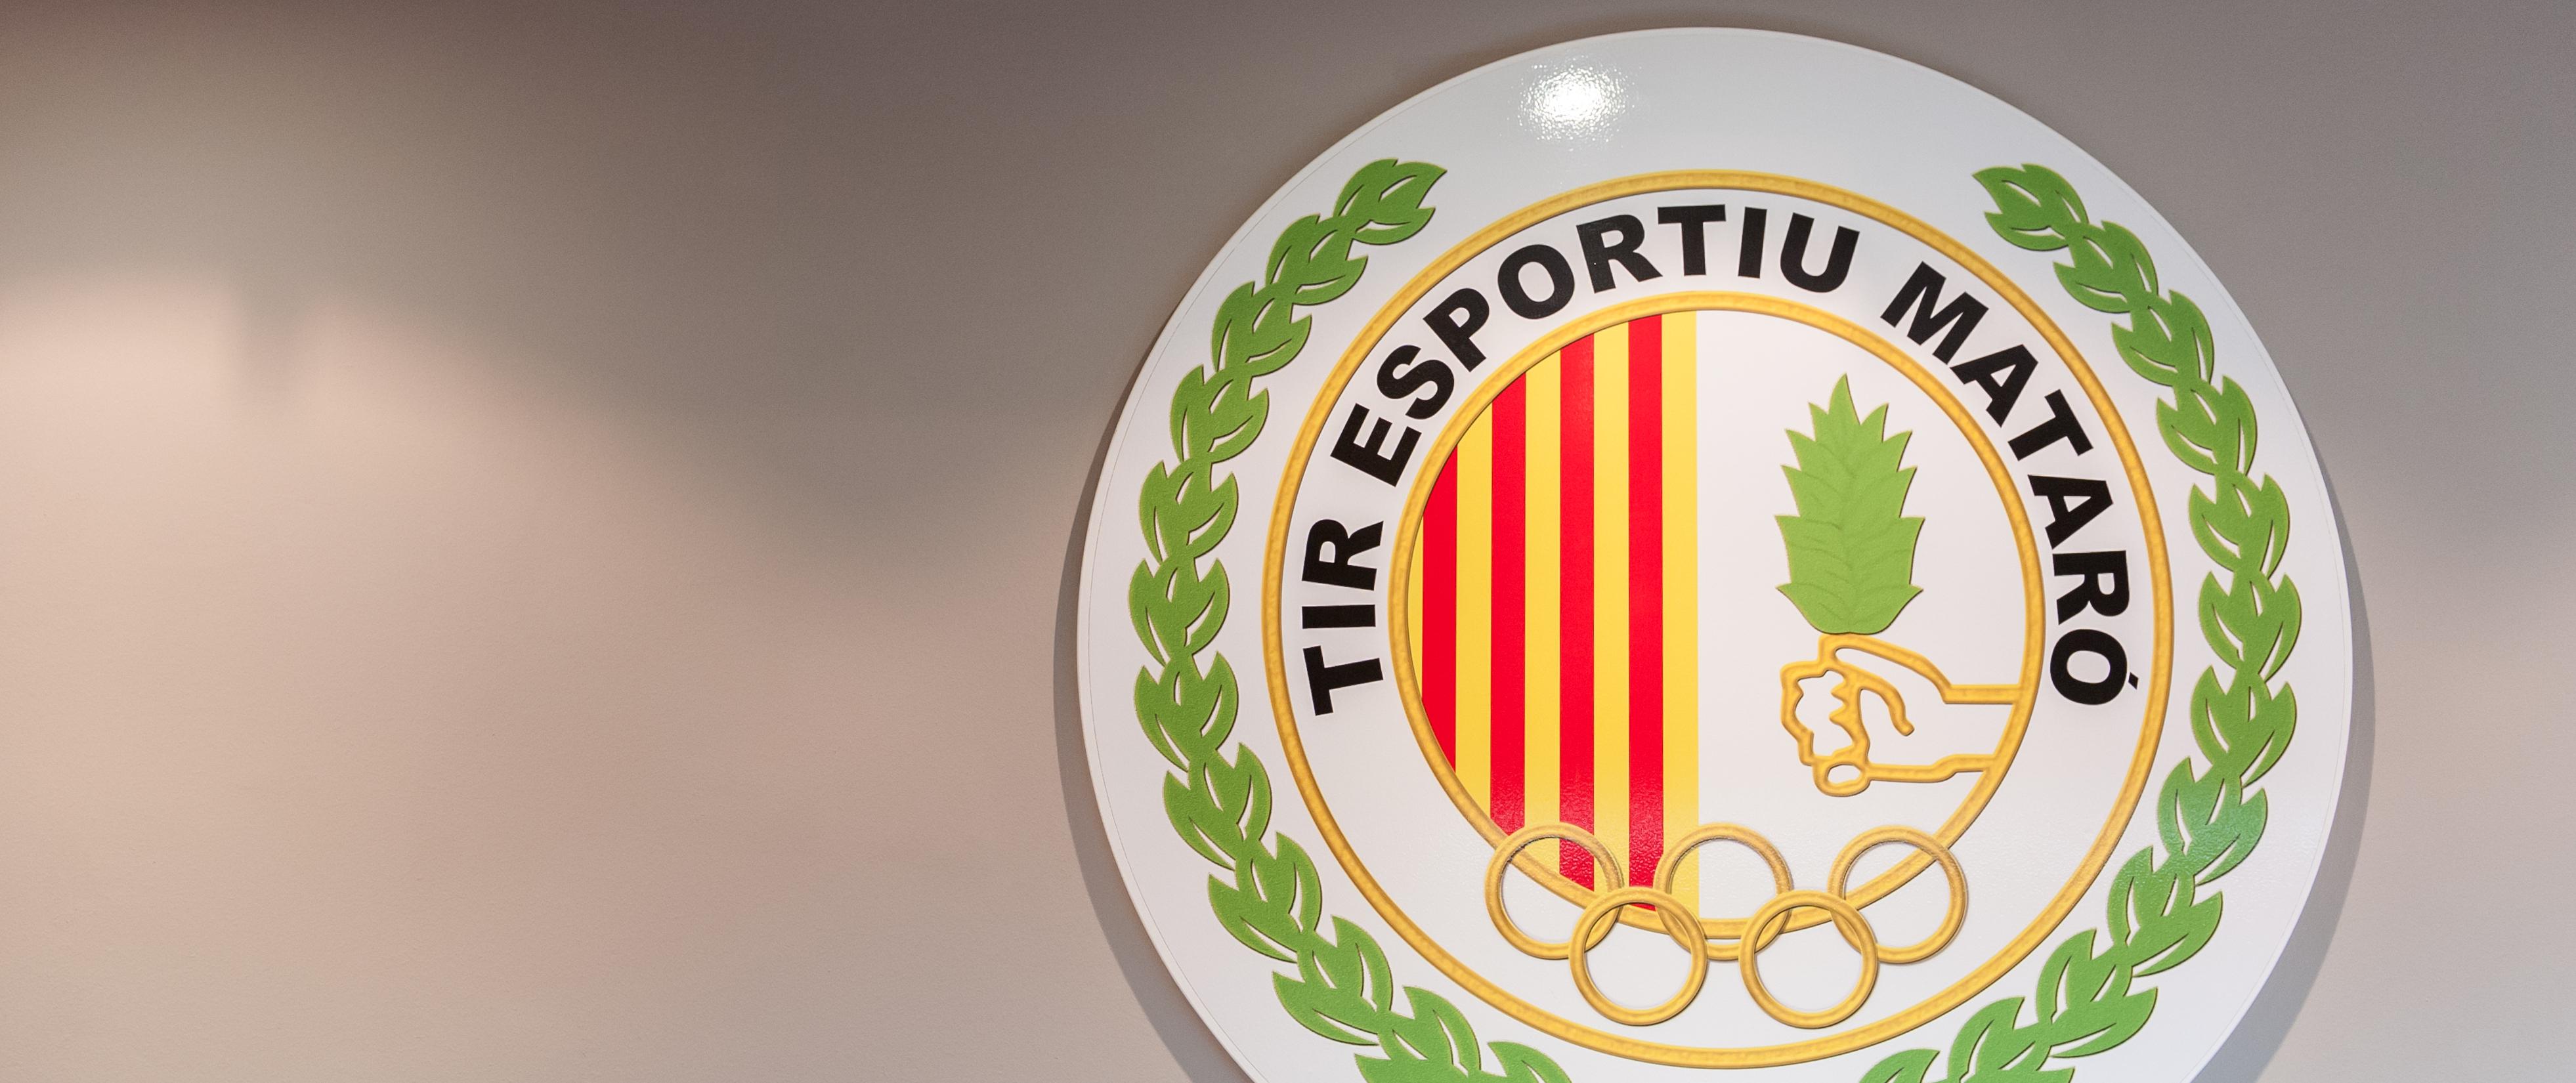 Tir esportiu Mataró Oficines